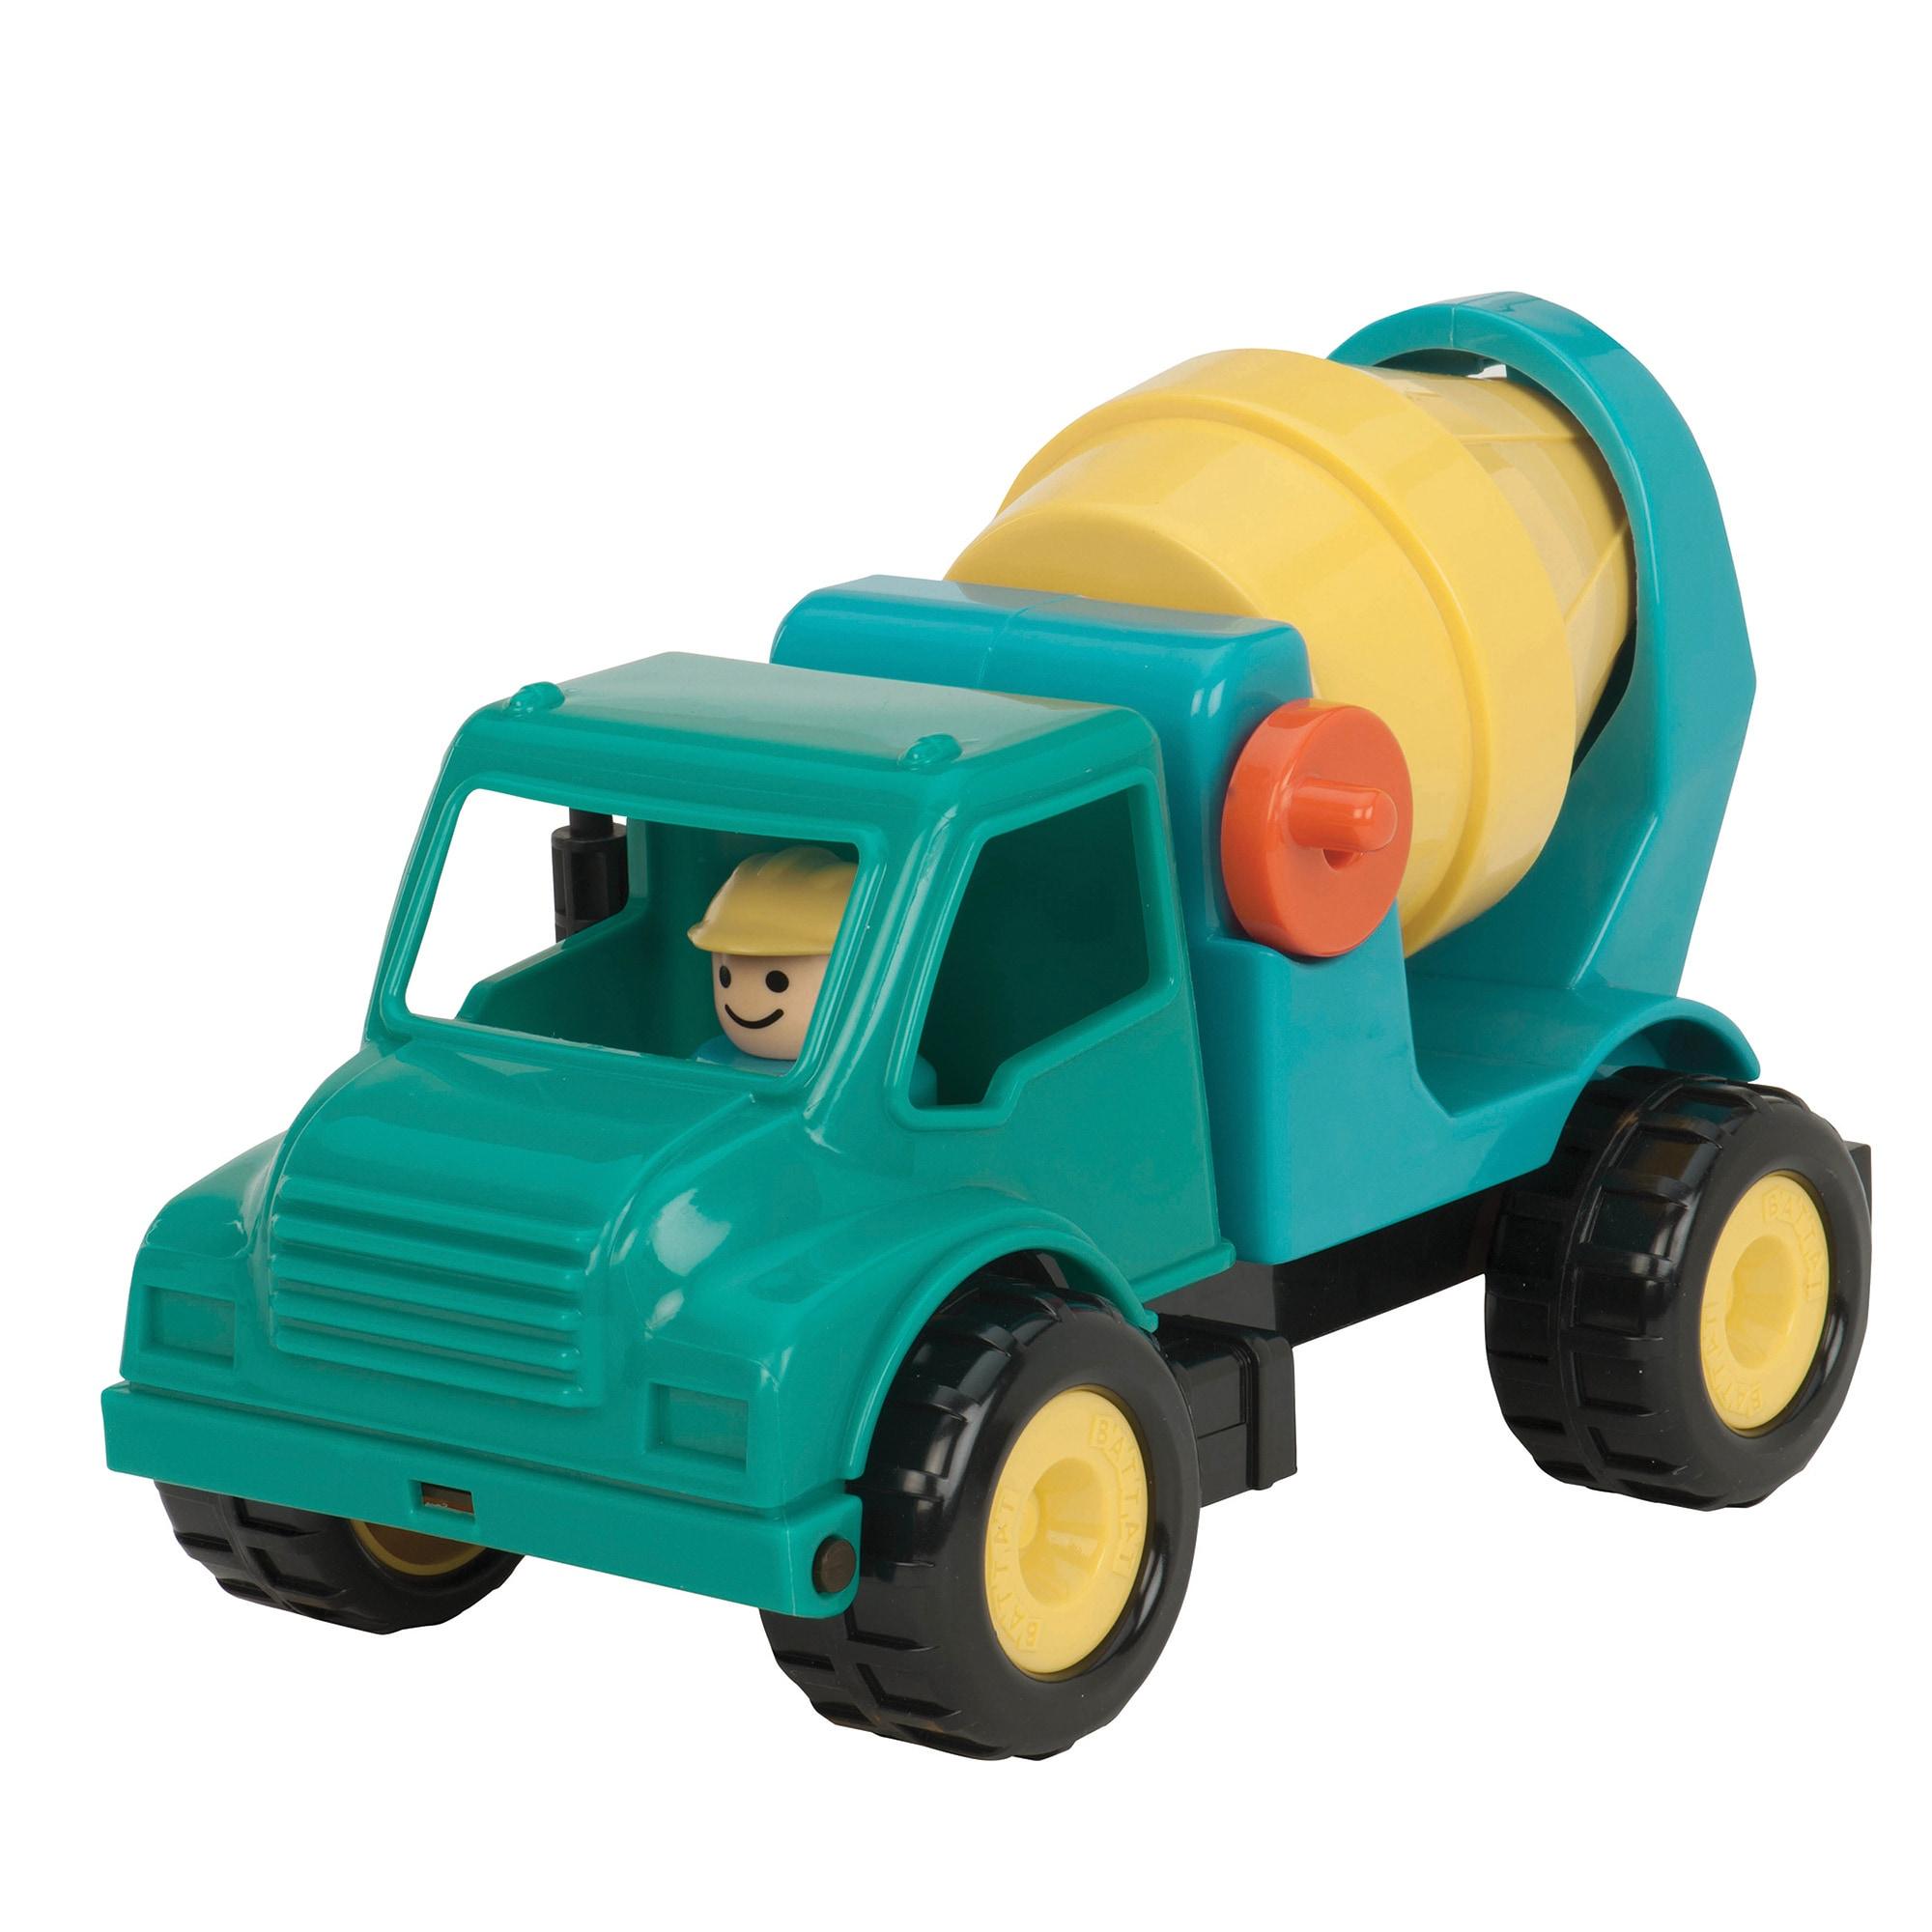 Toysmith Toy Cement Truck (G062243267459), Multi